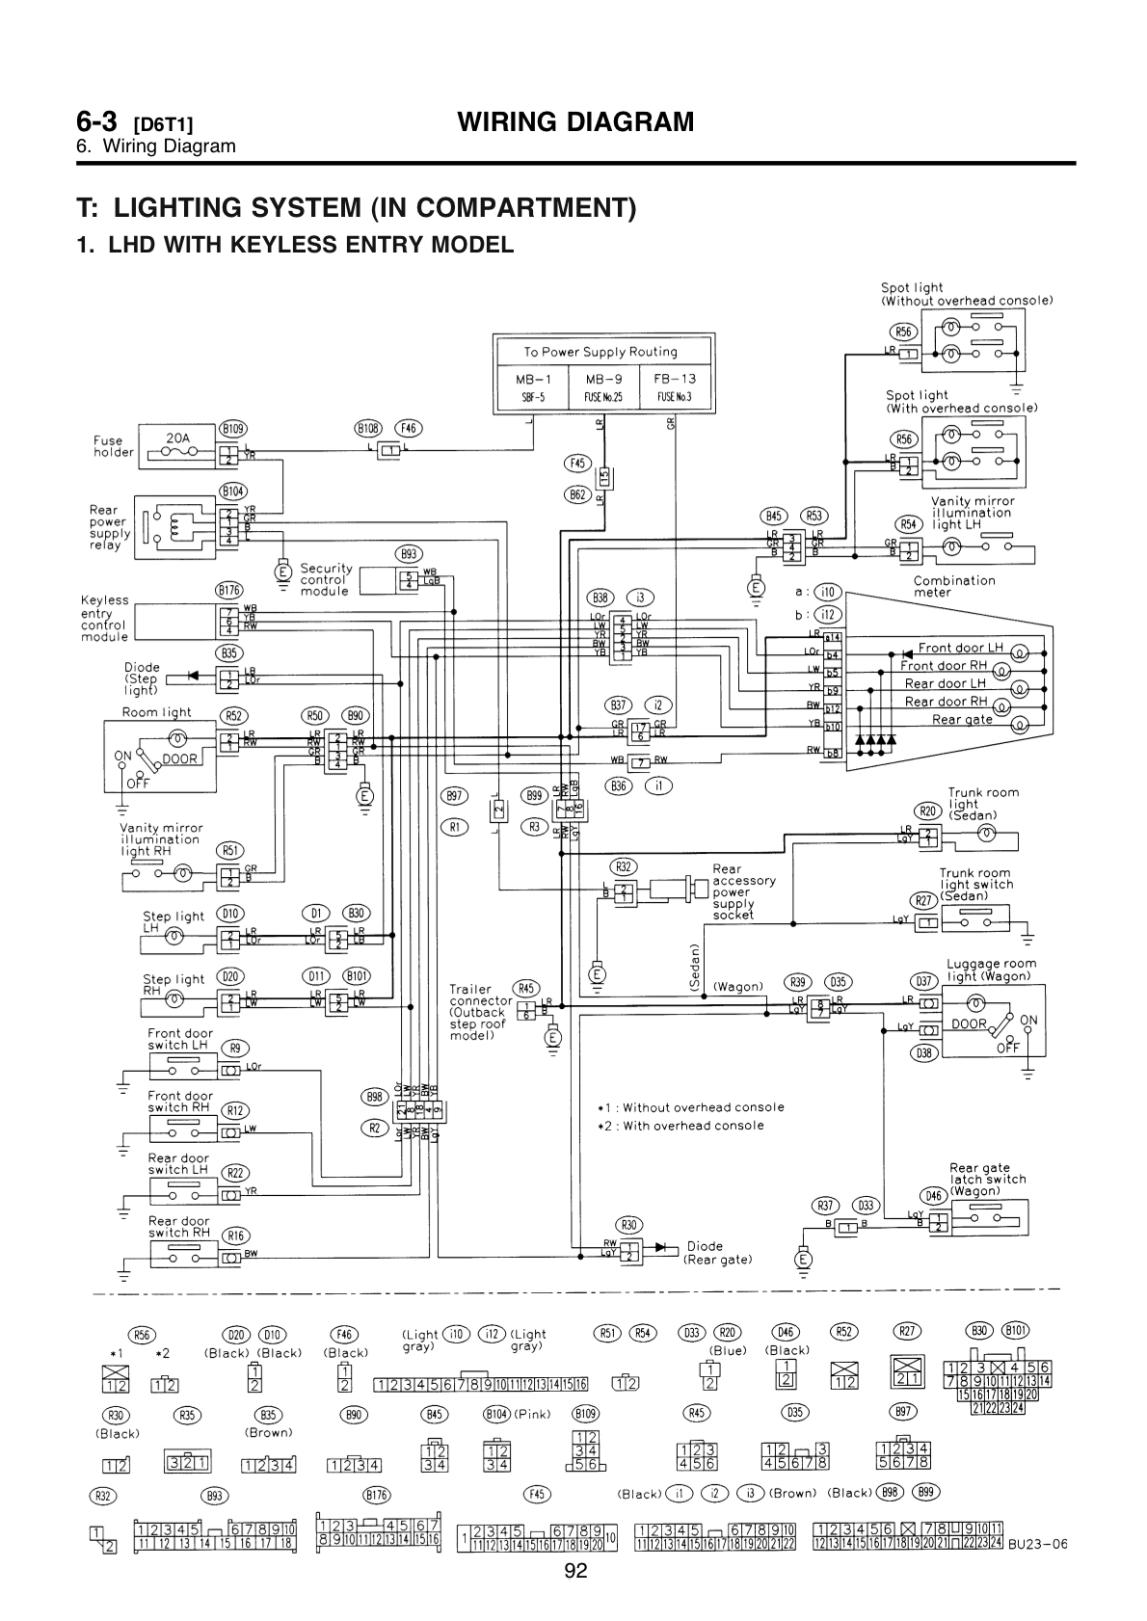 2002 subaru forester wiring diagram 2002 image subaru forester wiring diagram 2002 wiring diagrams on 2002 subaru forester wiring diagram